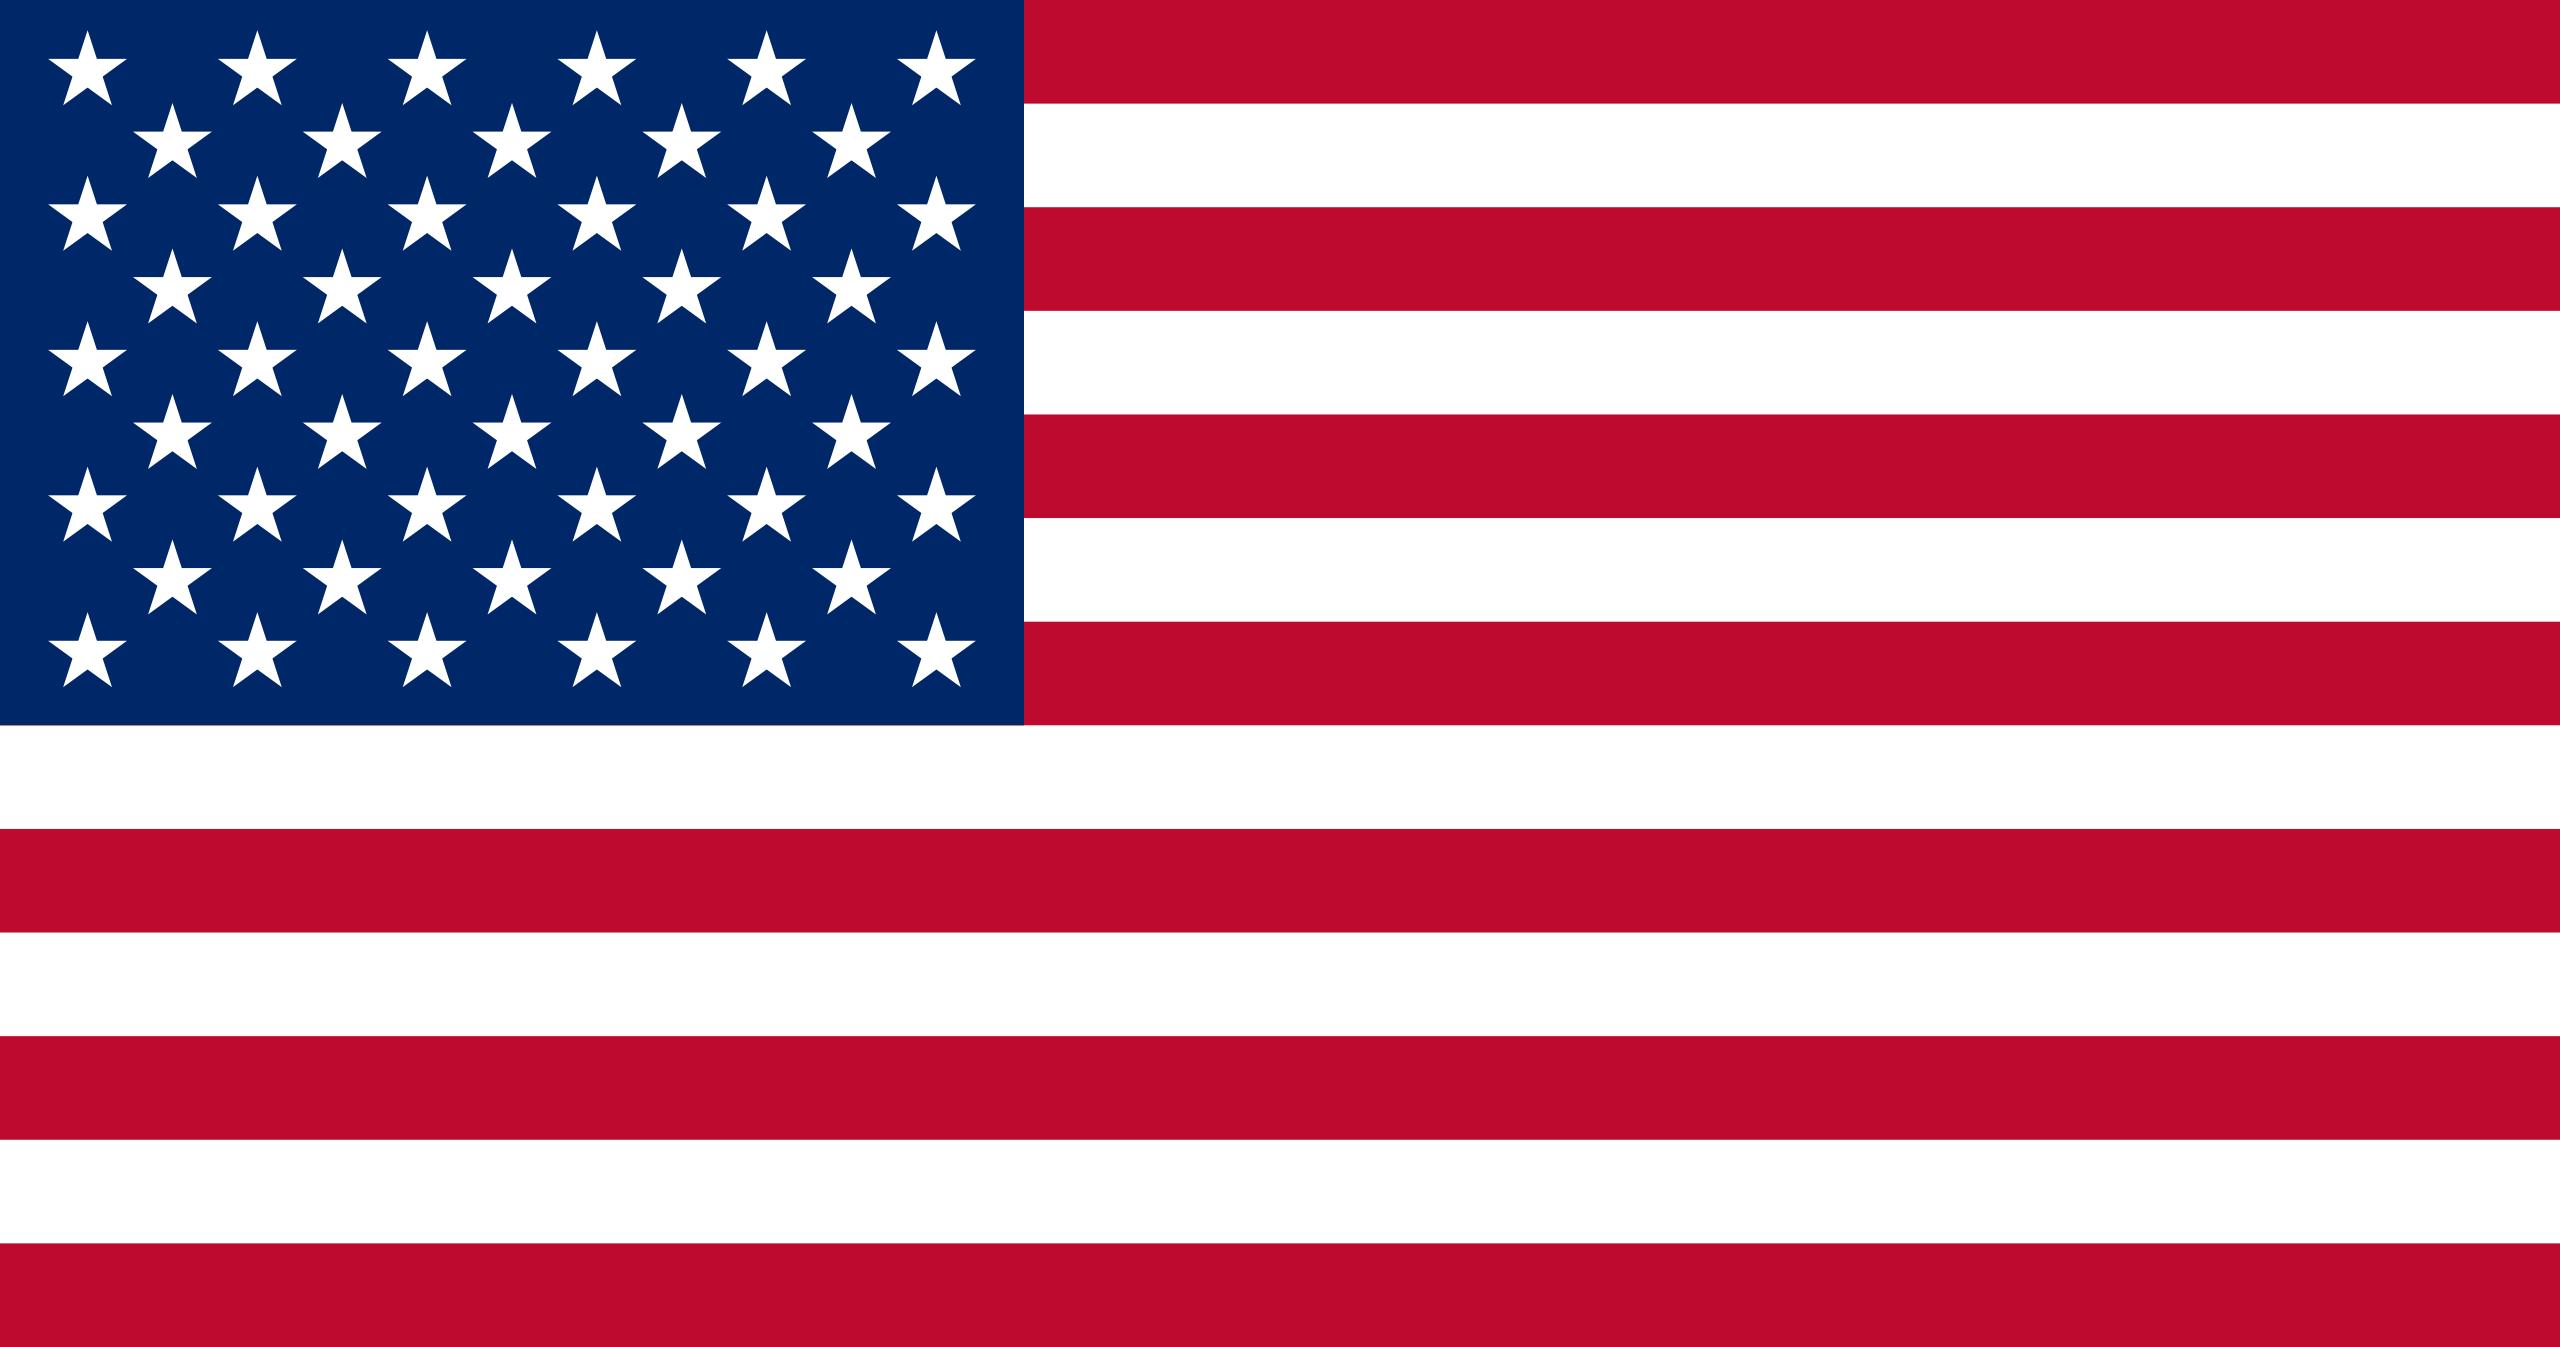 estados unidos, país, emblema, insignia, símbolo - Fondos de Pantalla HD - professor-falken.com